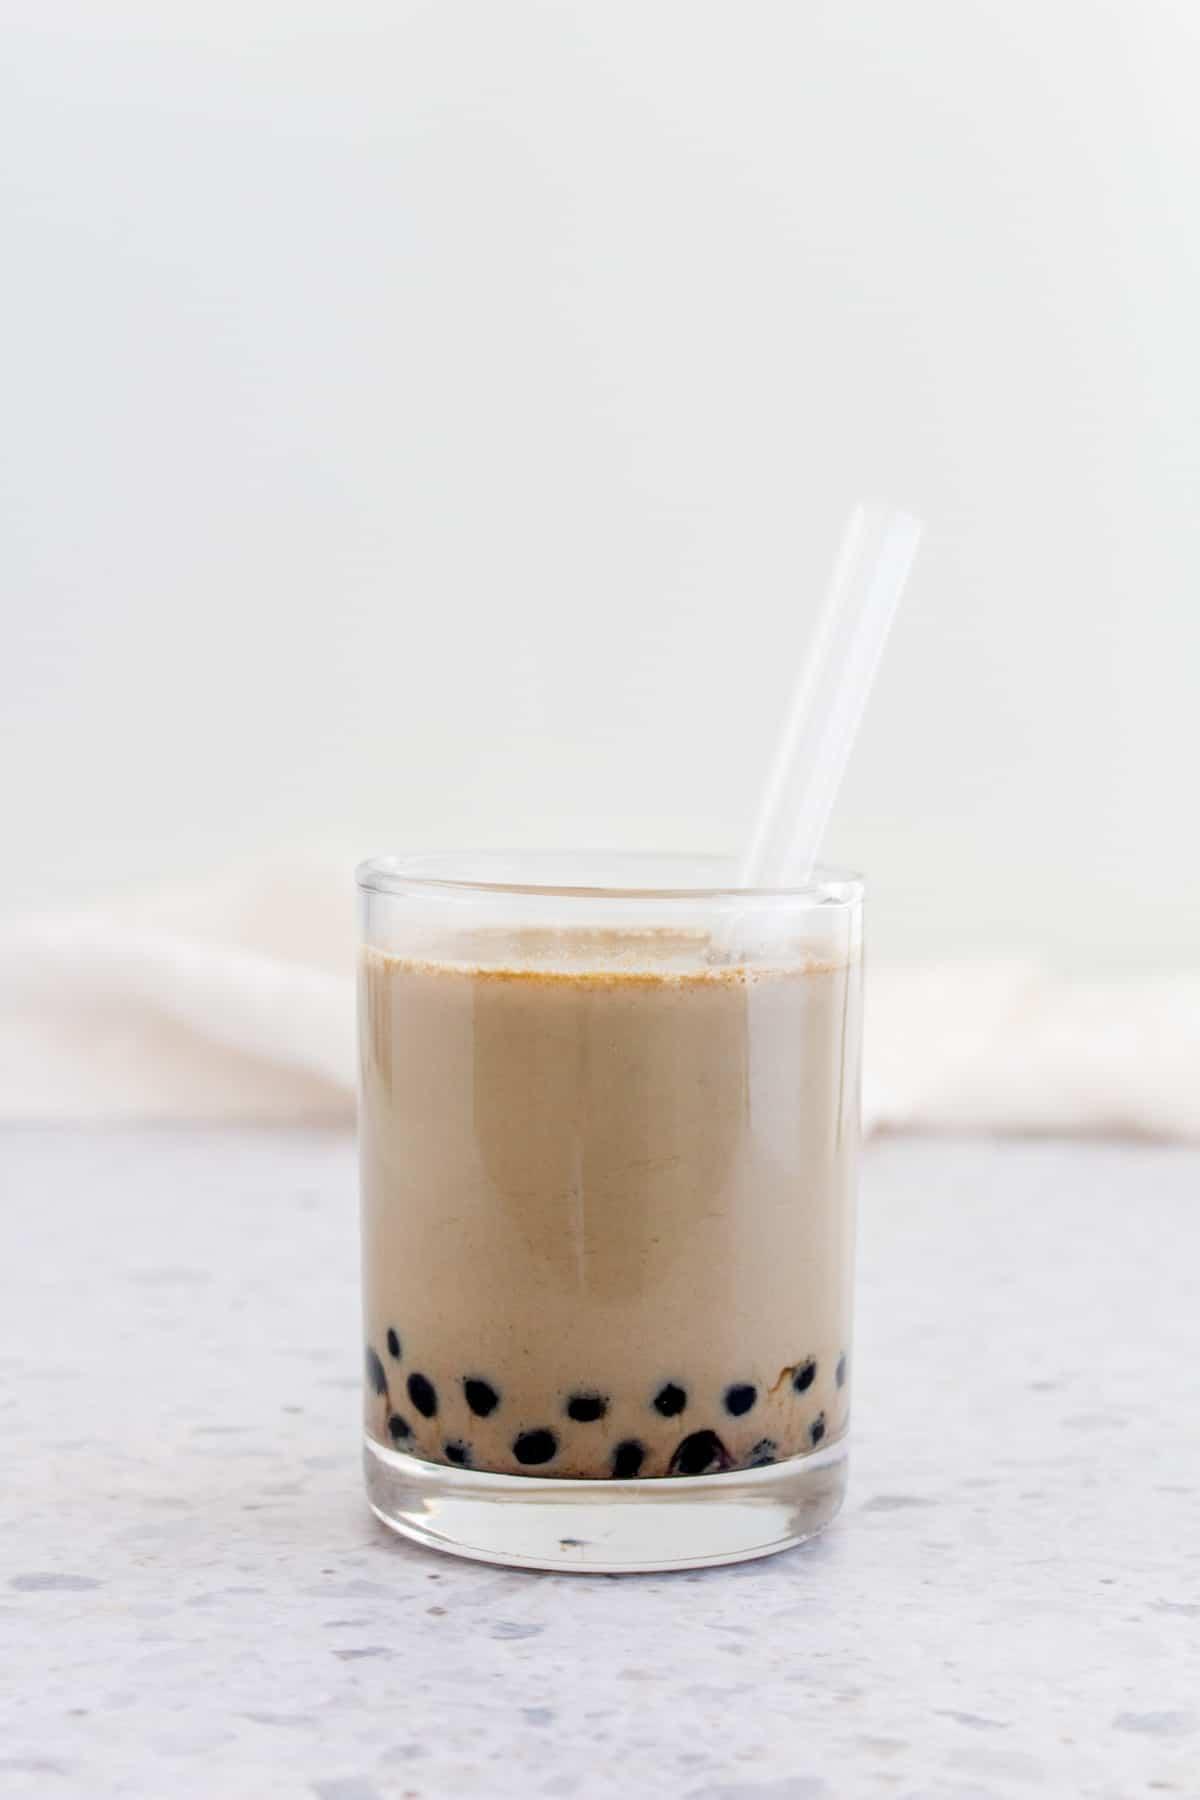 Hojicha boba tea in a cup.